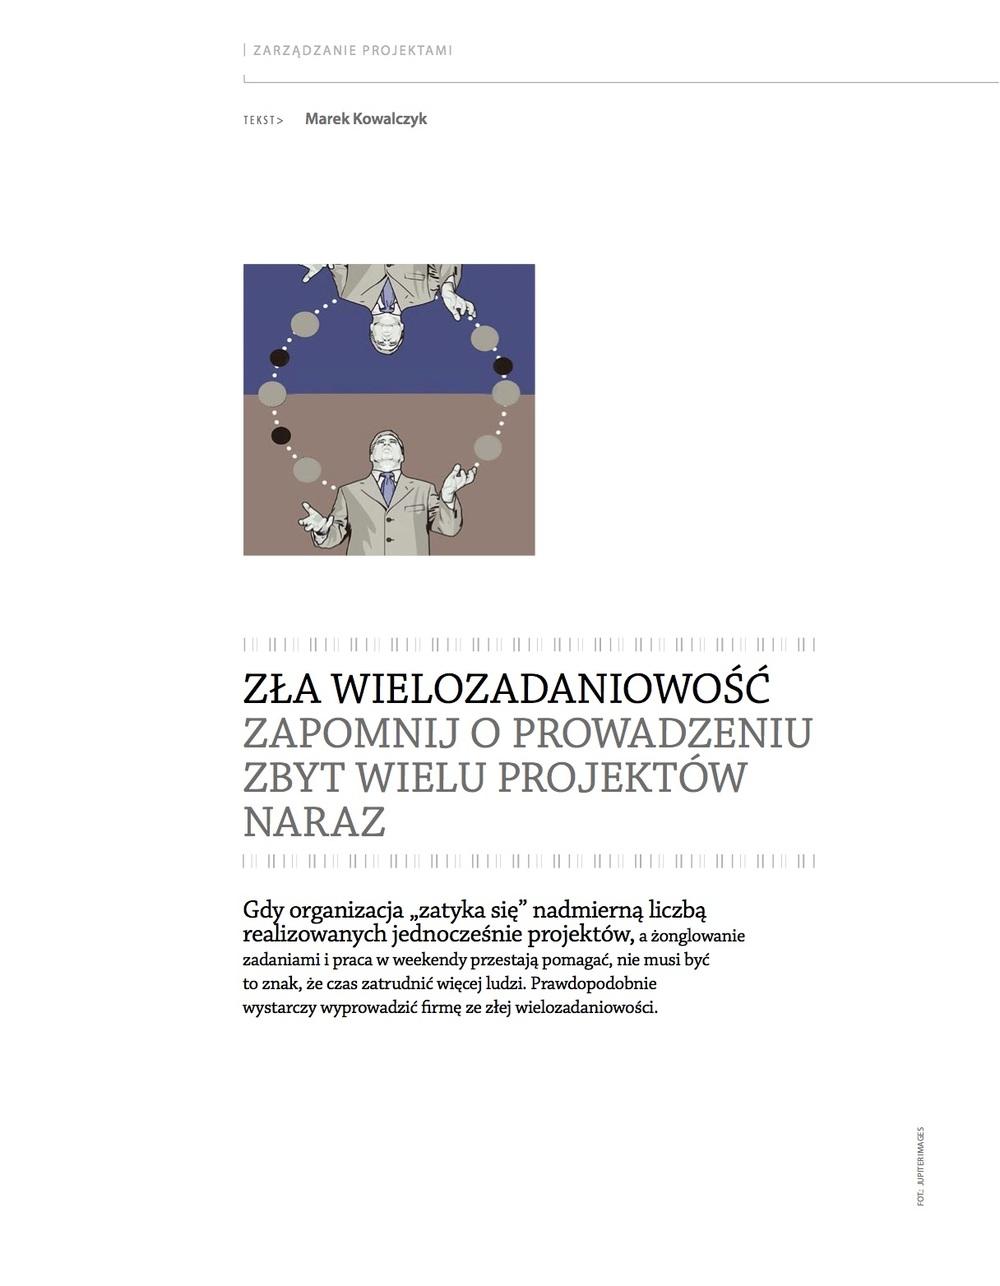 MANDARINE_Artykul_Zla_wielozadaniowosc cover.jpg